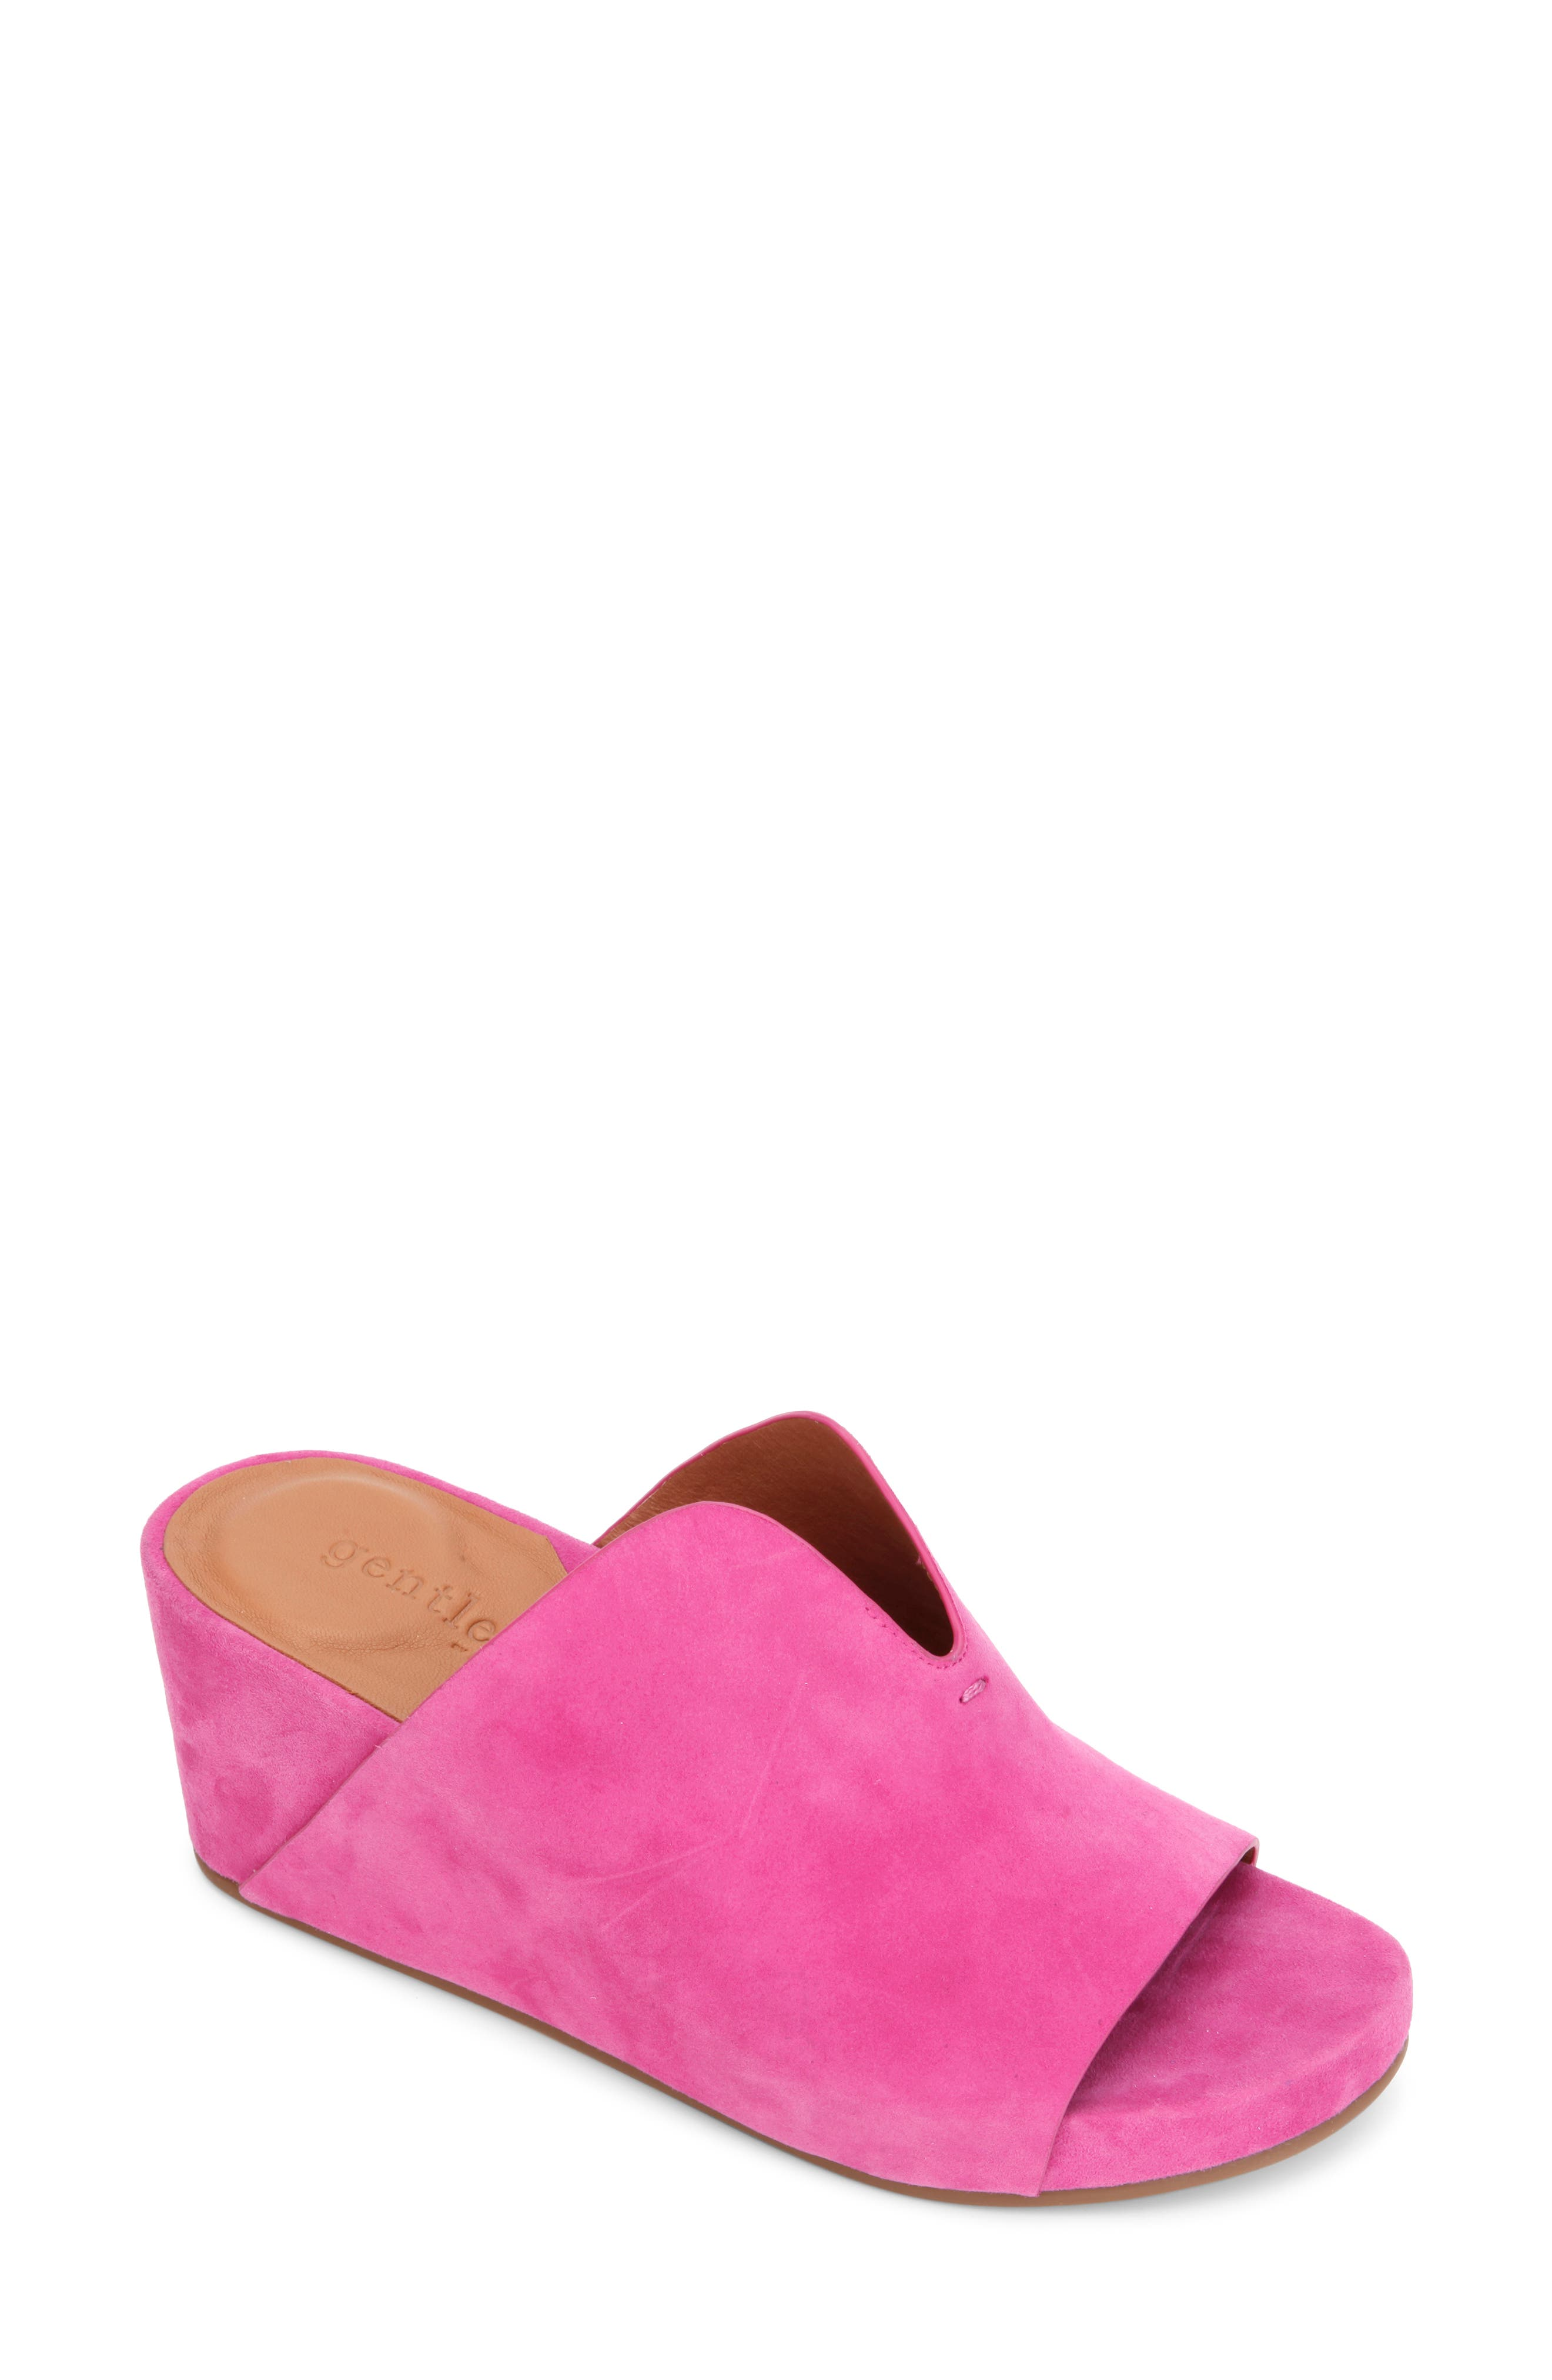 Women's Gentle Souls Gisele 65 Slide Wedge Sandal